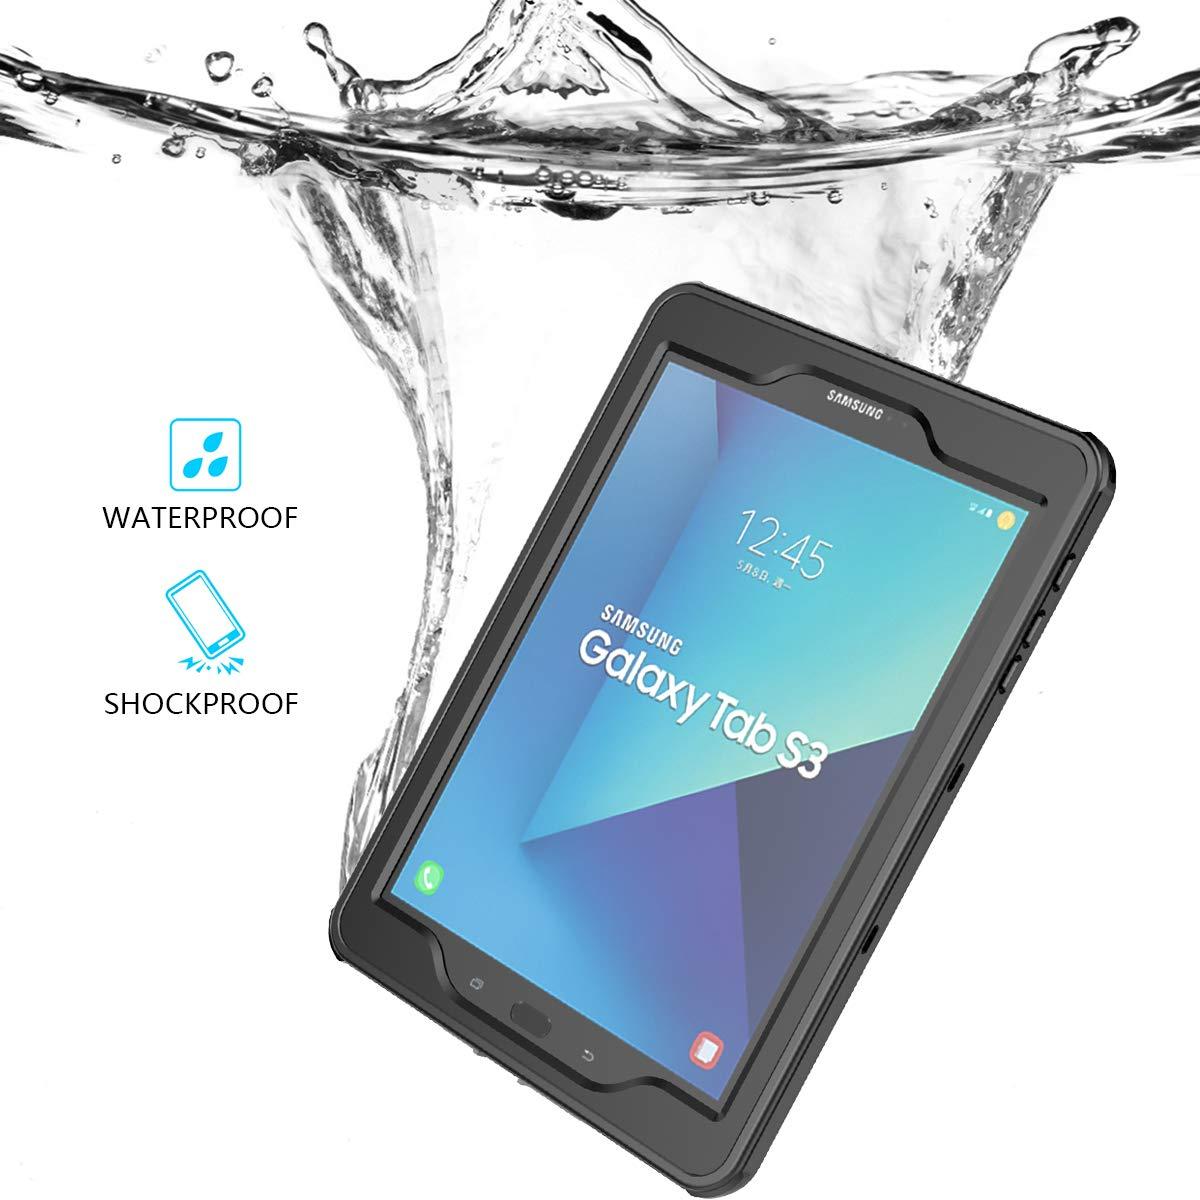 人気商品は Scheam B07L86G48H Samsung Galaxy Tab S3 9.7 防水ケース 防水 IP-68 防水 Samsung 耐衝撃 防塵 防雪 フルボディ保護ケース Samsung Galaxy Tab S3 9.7用交換ケース ブラック B07L86G48H, 月形町:af82b2bb --- a0267596.xsph.ru